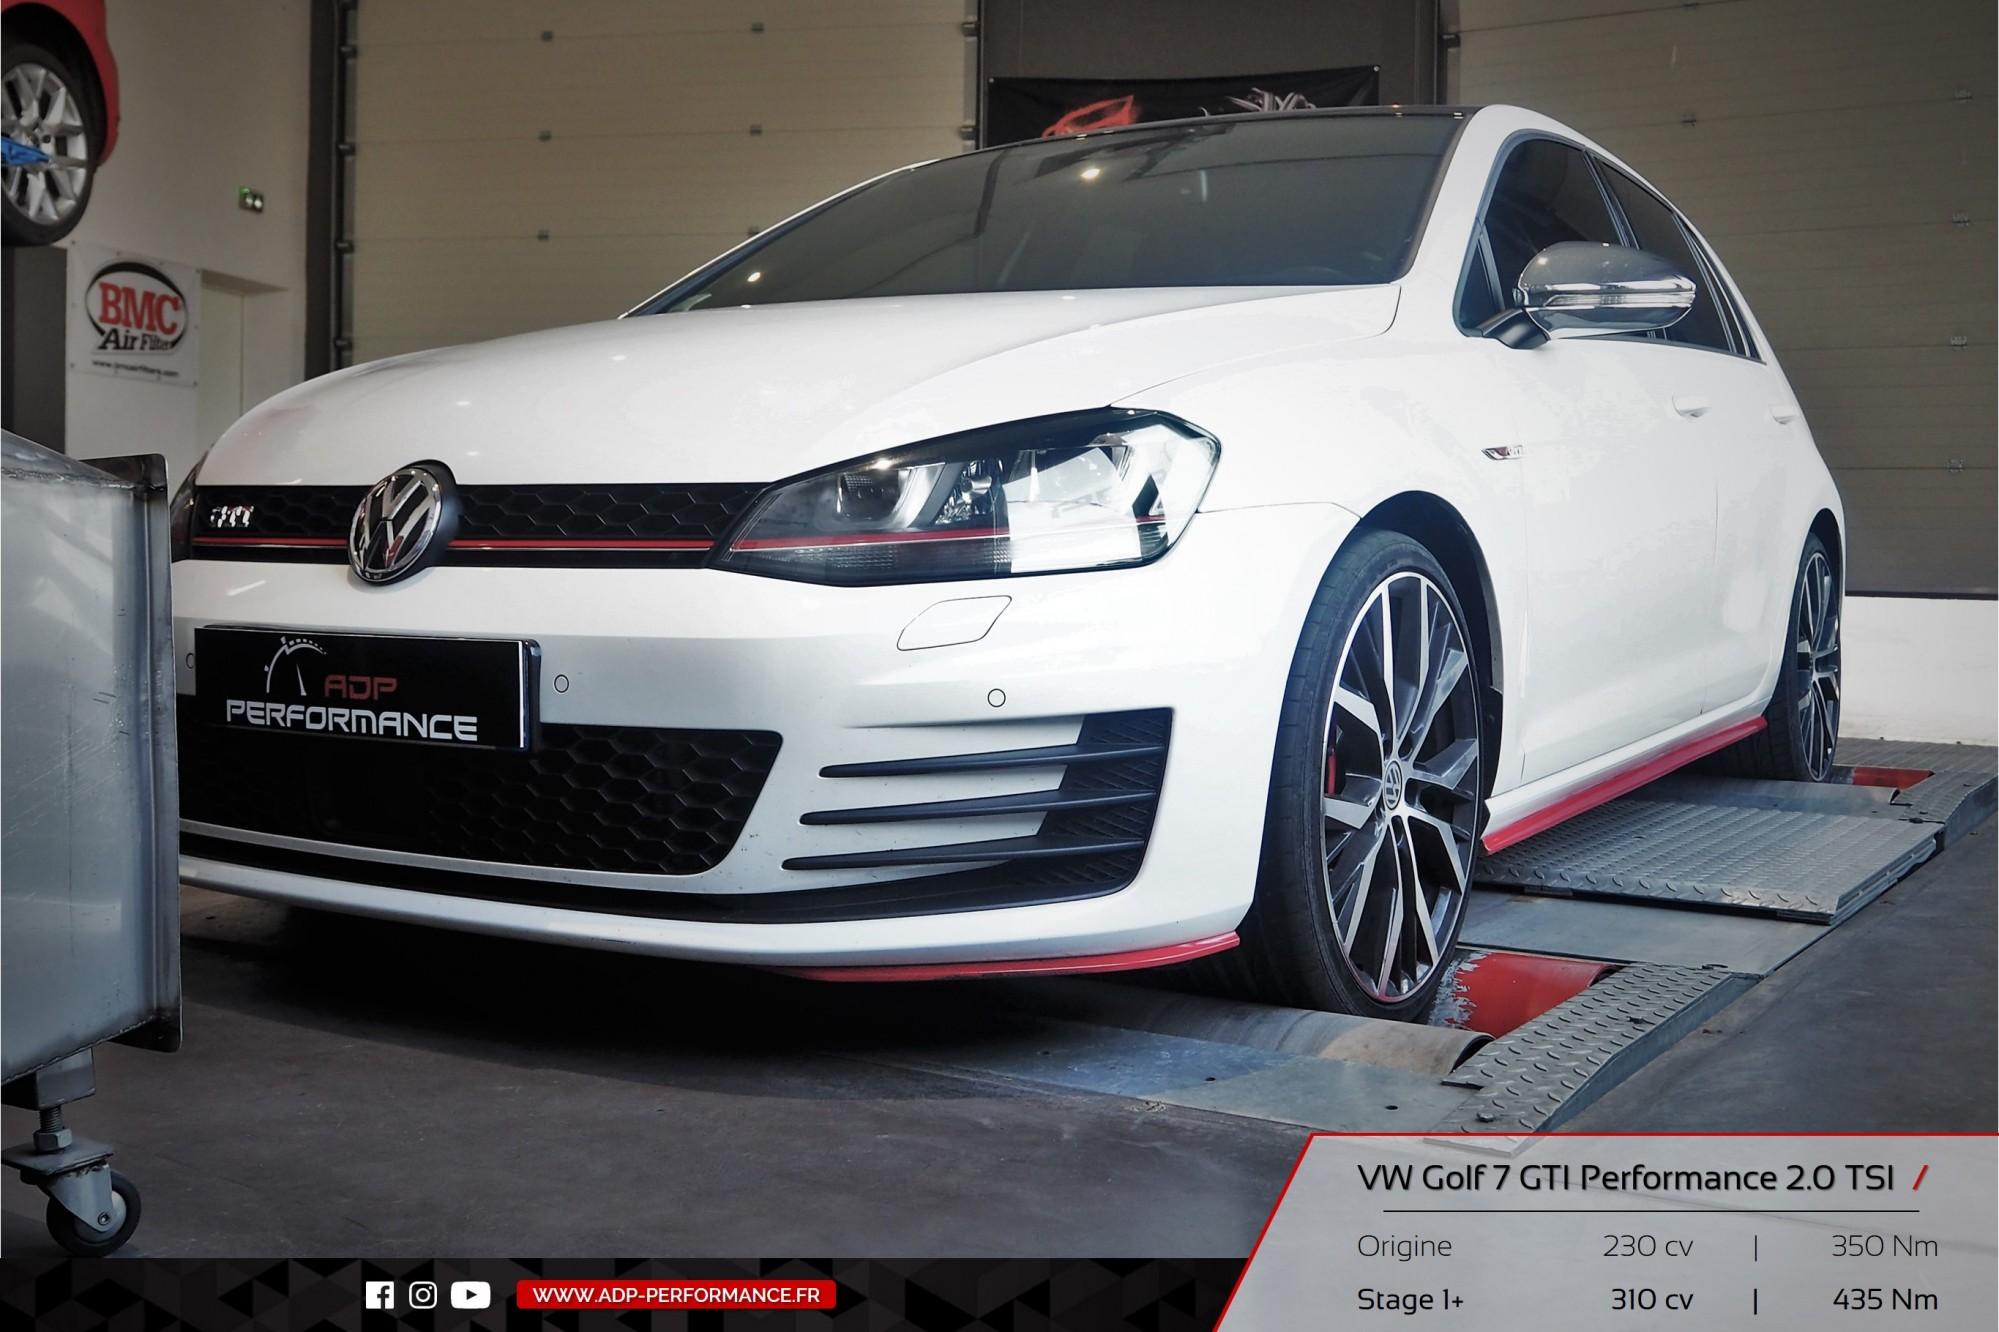 Reprogrammation moteur - VW Golf 7 GTI Performance 2.0 TSI 230cv Nimes, Arles, St Martin de Crau - ADP Performance